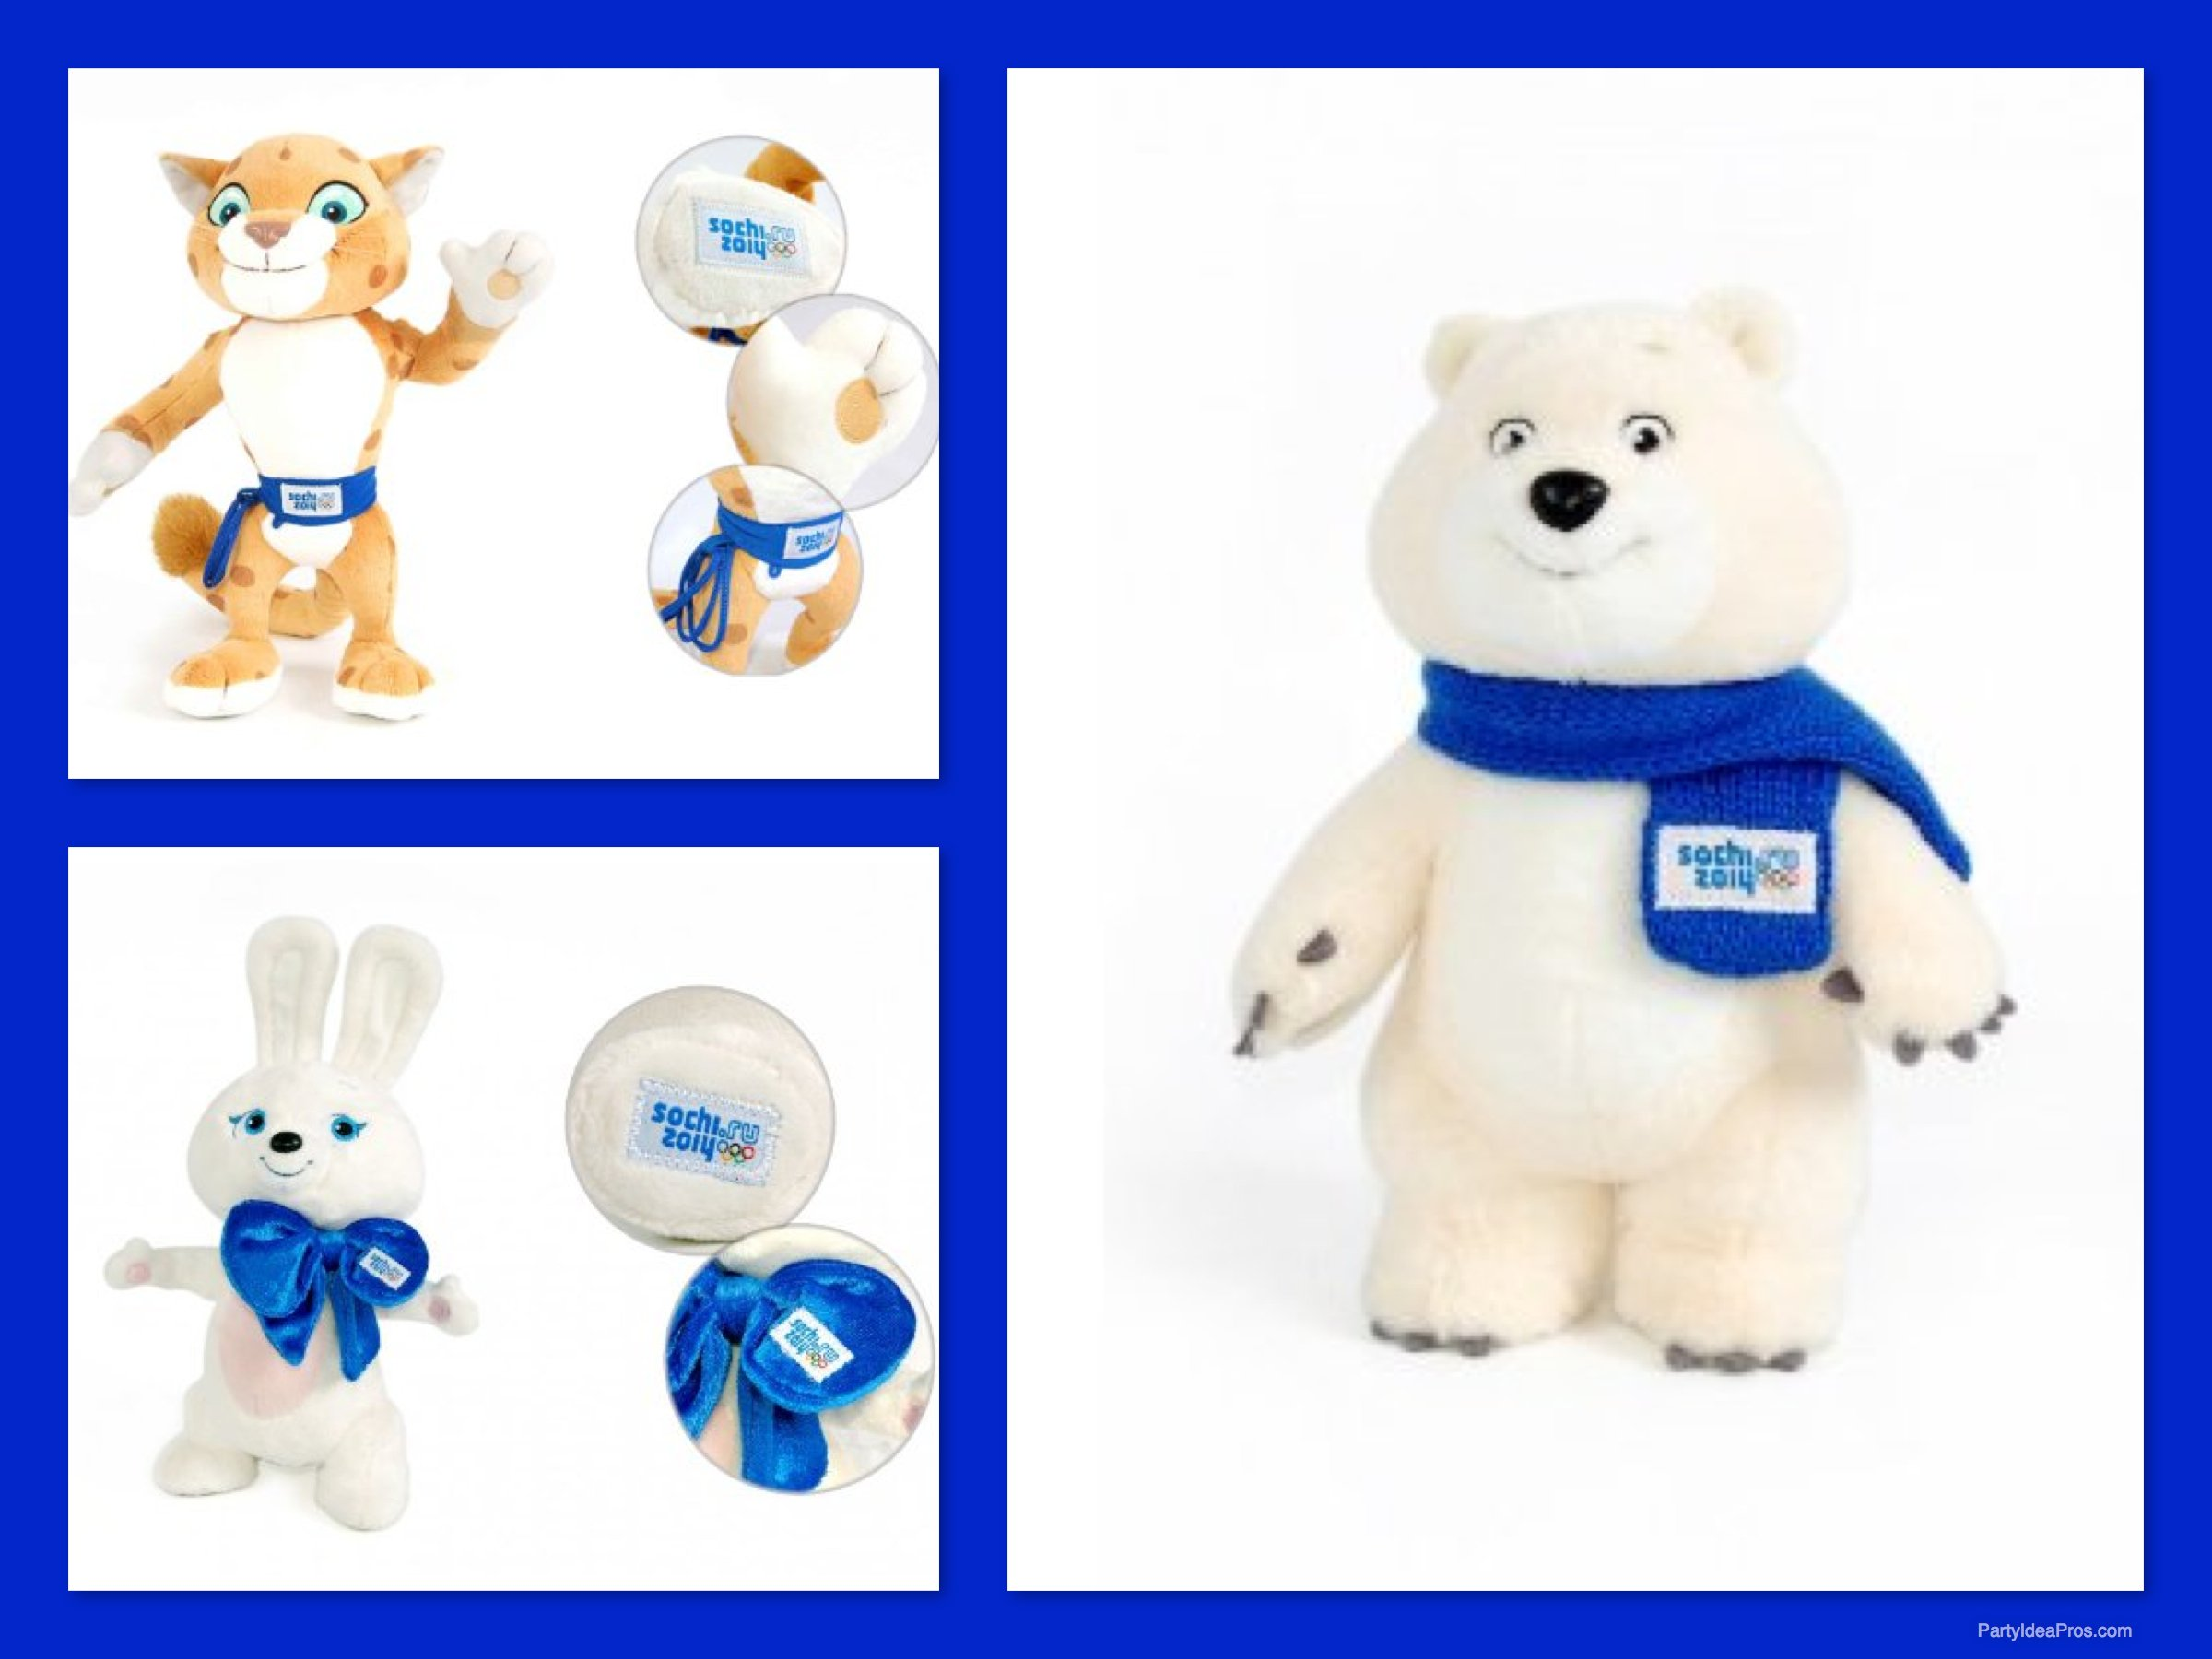 2014 Winter Olympics Mascot